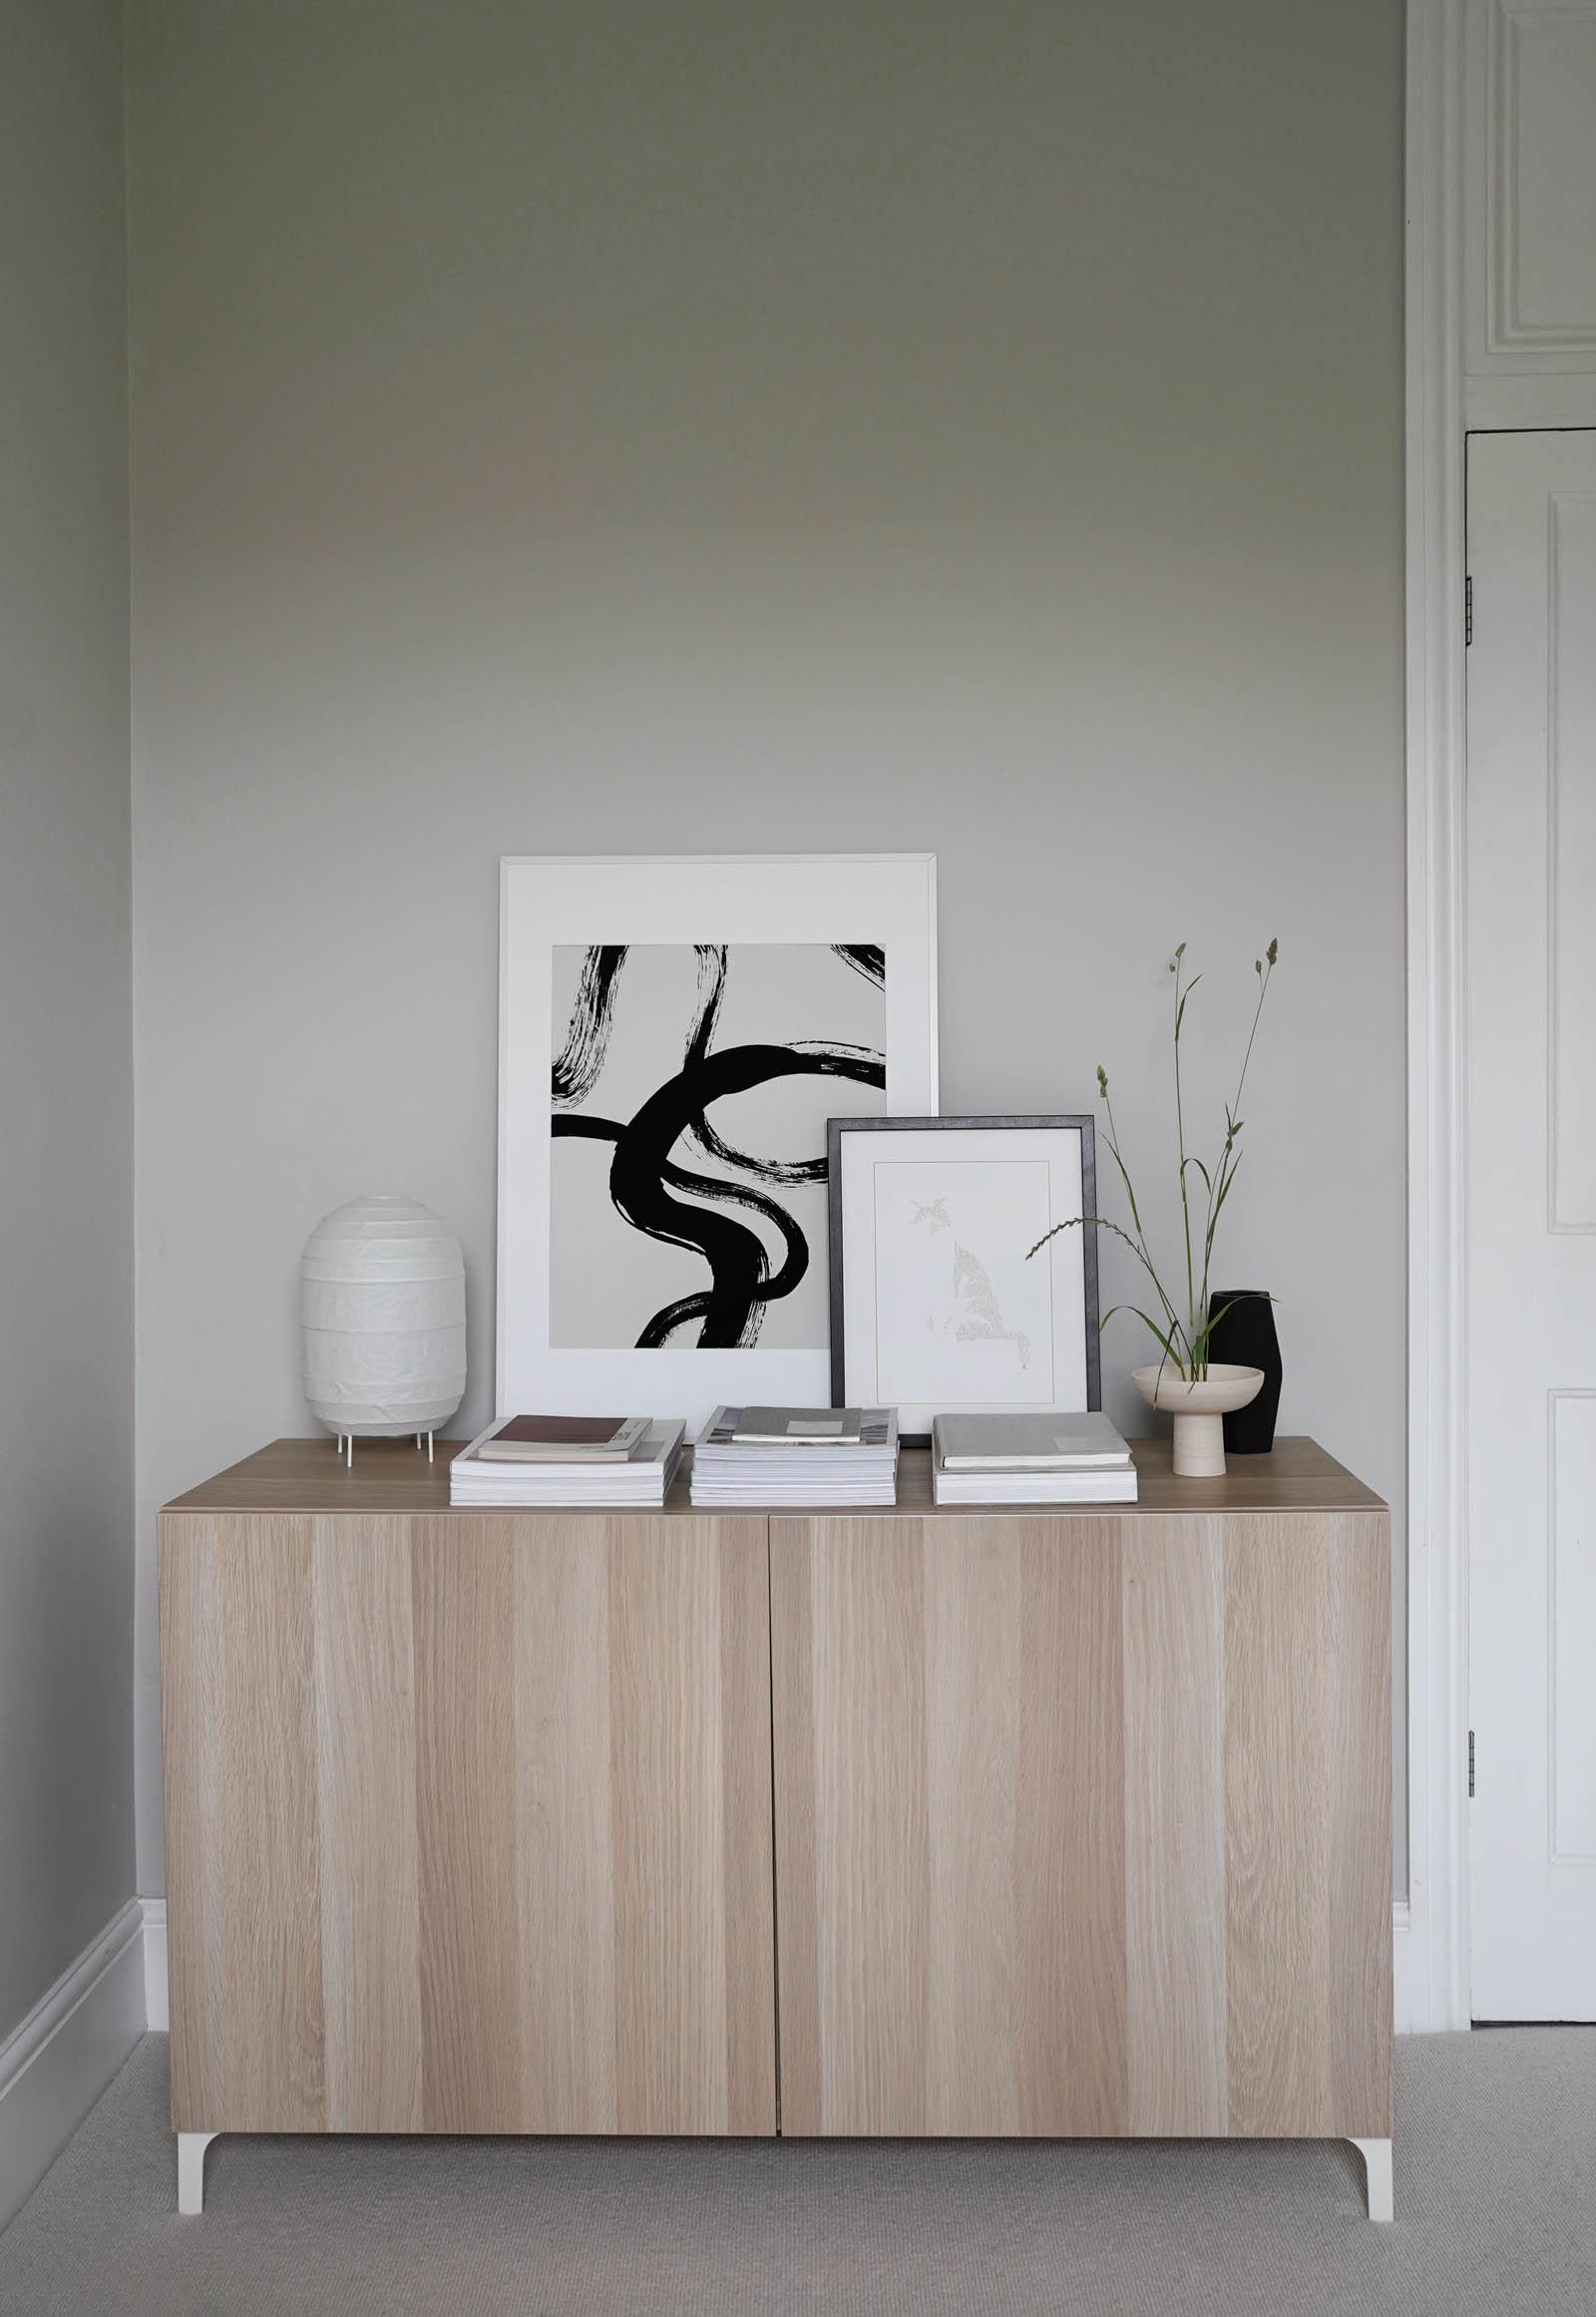 IKEA's oak BESTÅ storage cabinet, abstract artwork, Japandi-style Ikebana arrangement and soft grey walls in a minimalist home office | These Four Walls blog